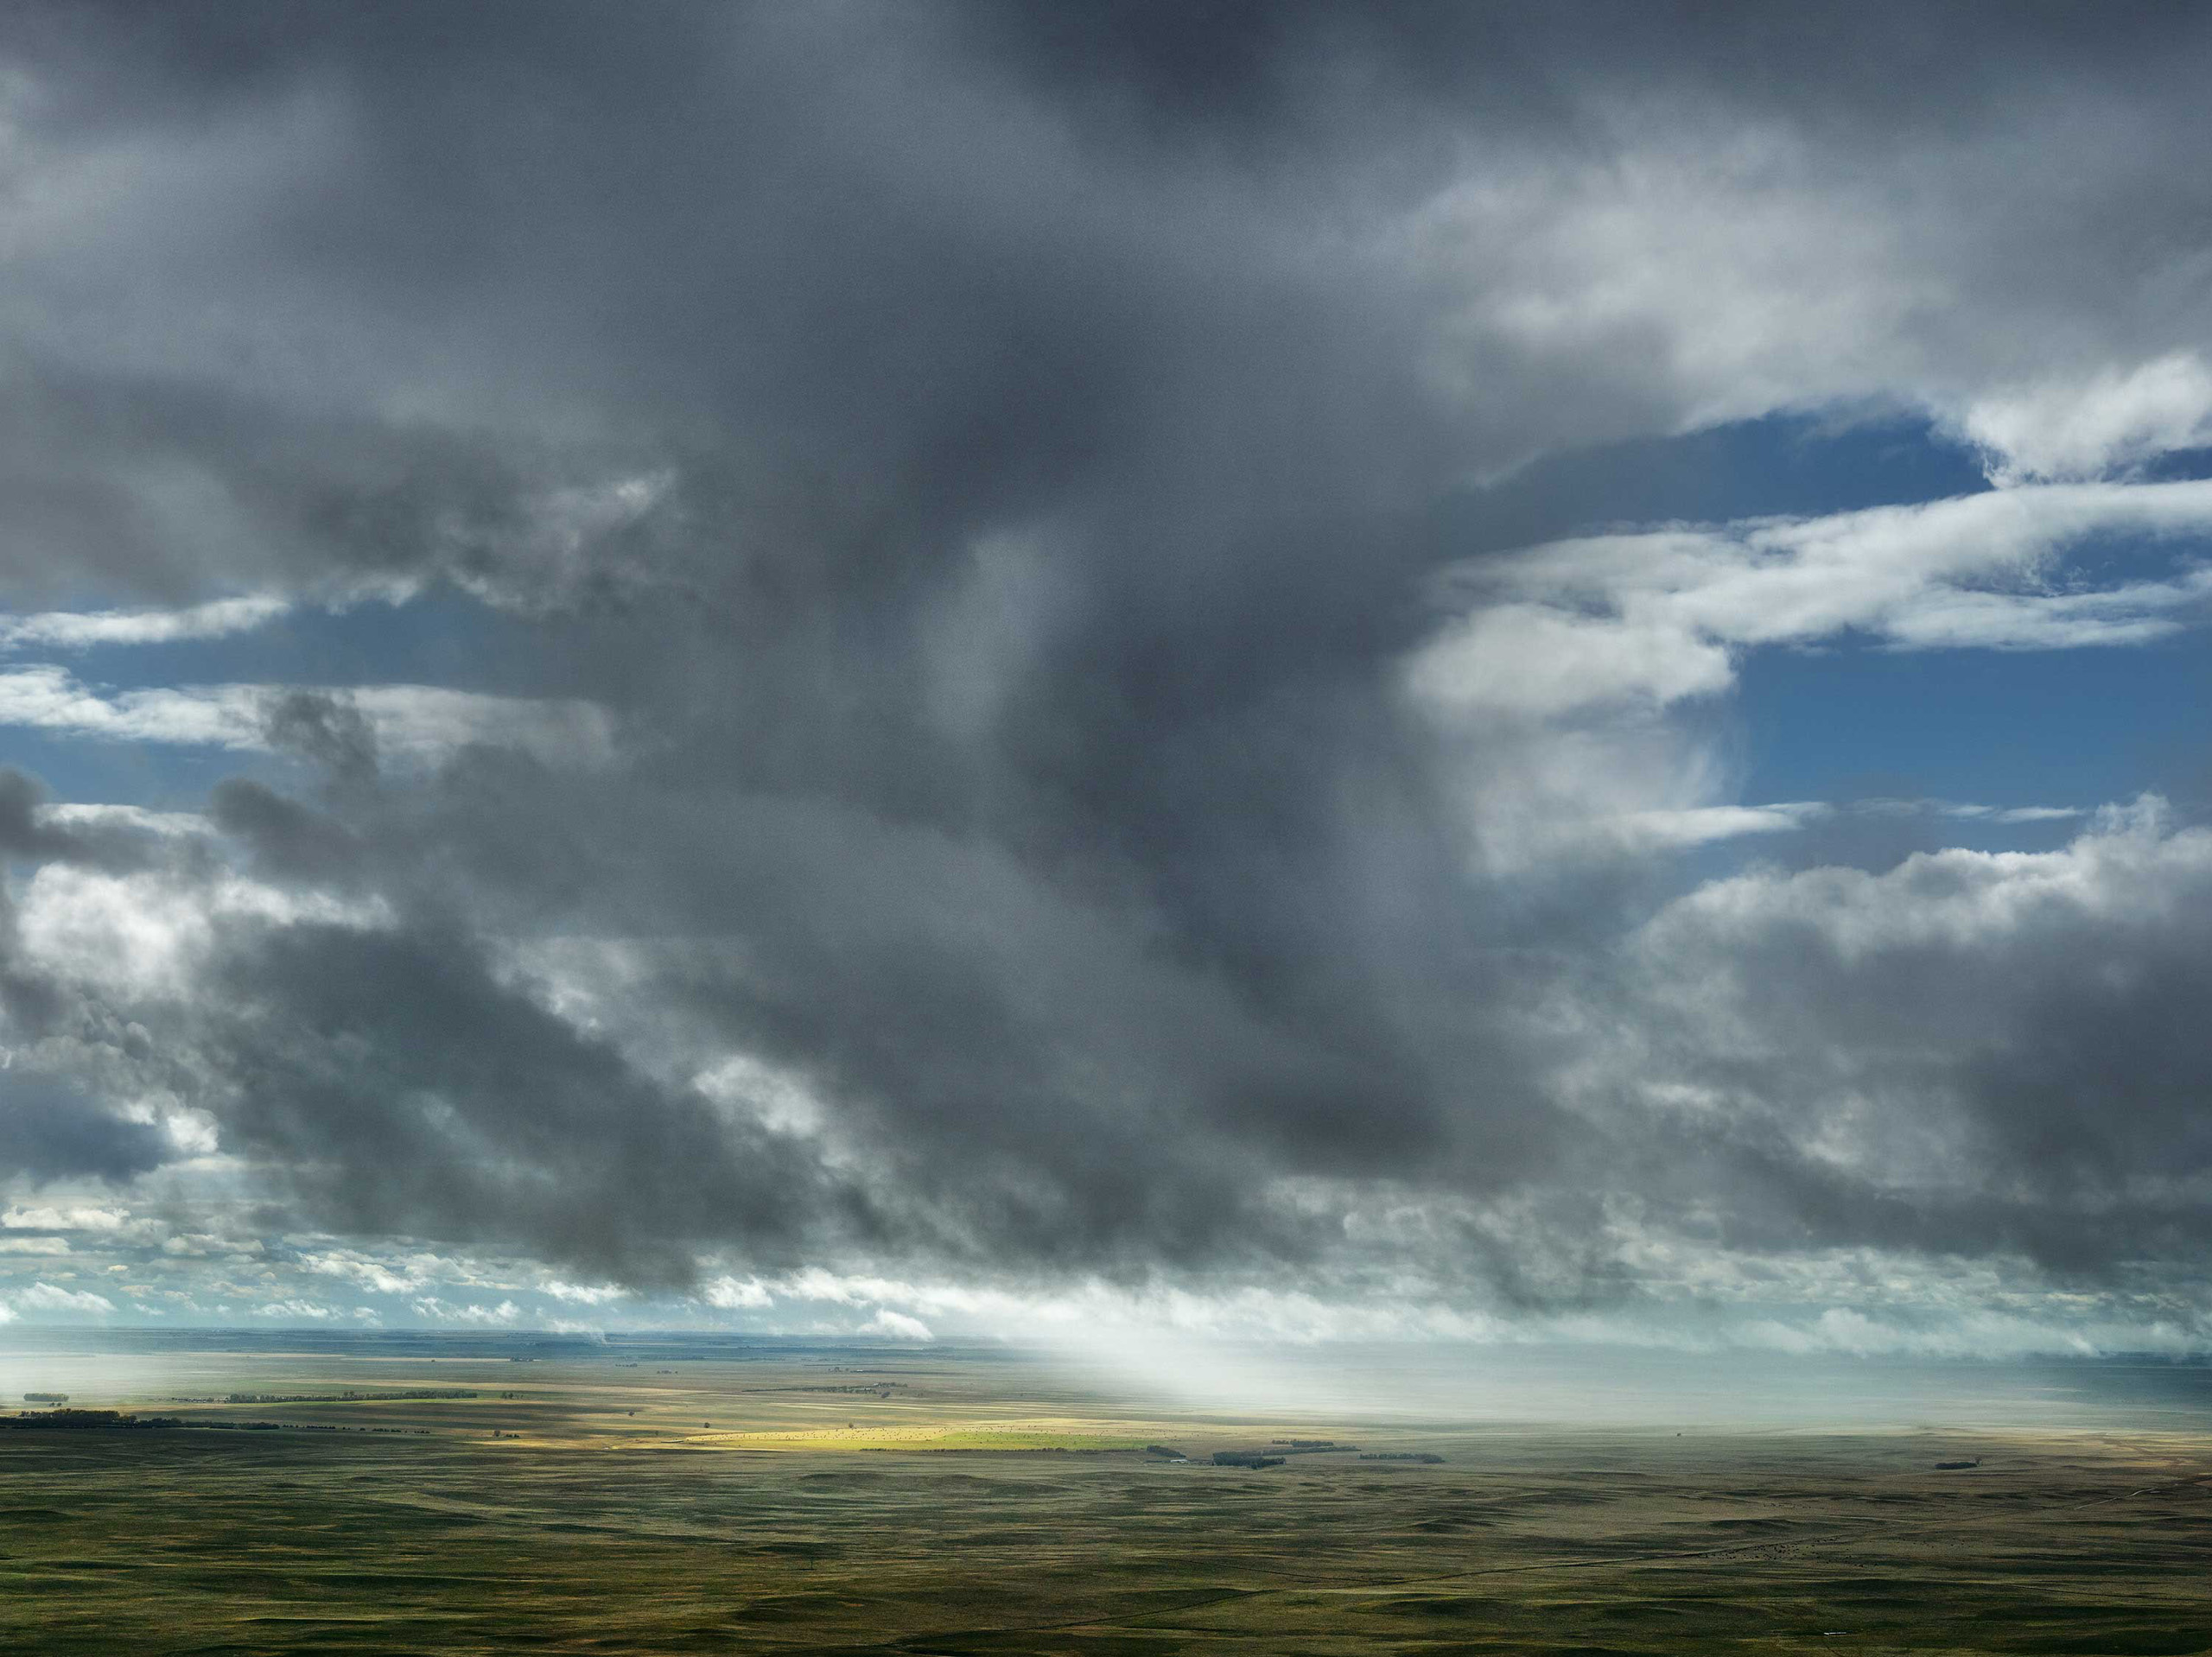 Sun Through Rain. Dawes County, Nebraska, 2013.